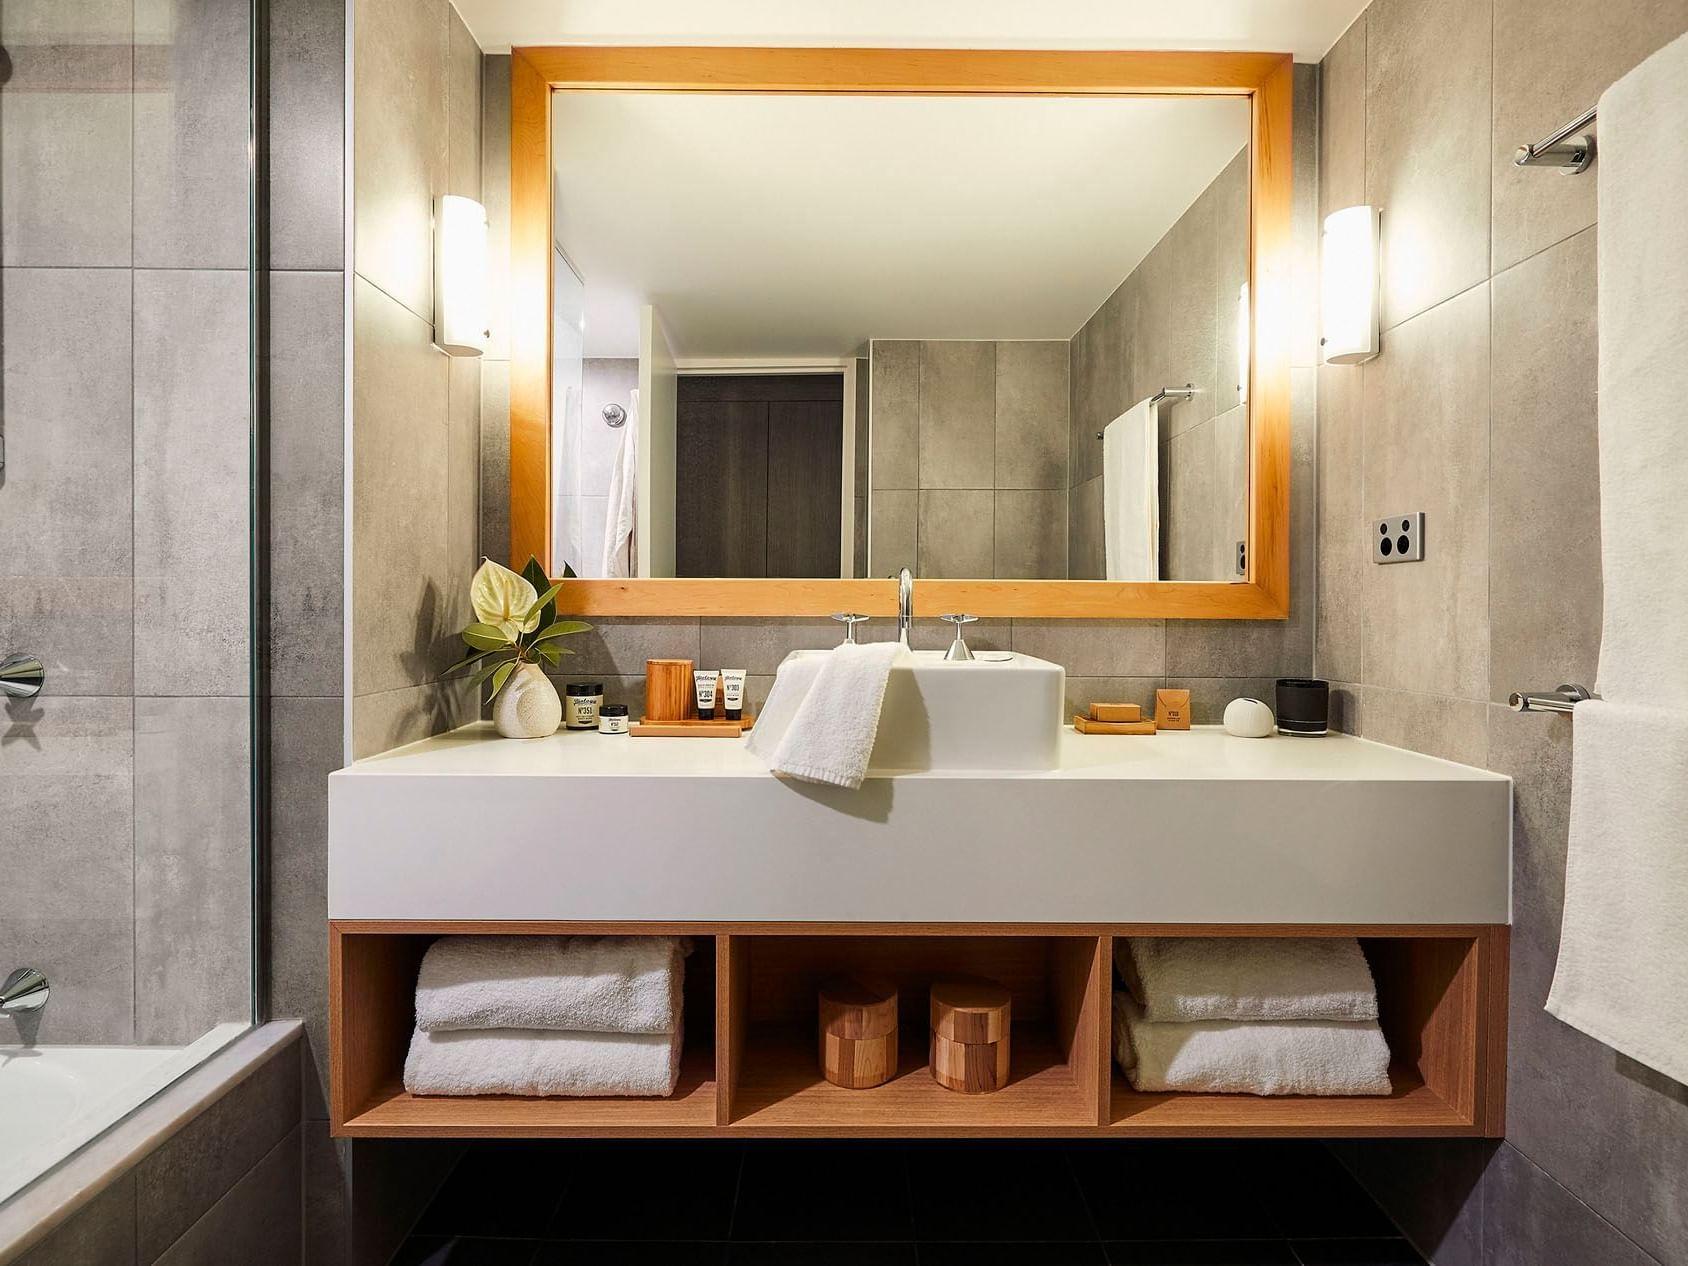 Bathroom mirror in Superior room at Daydream Island Resort